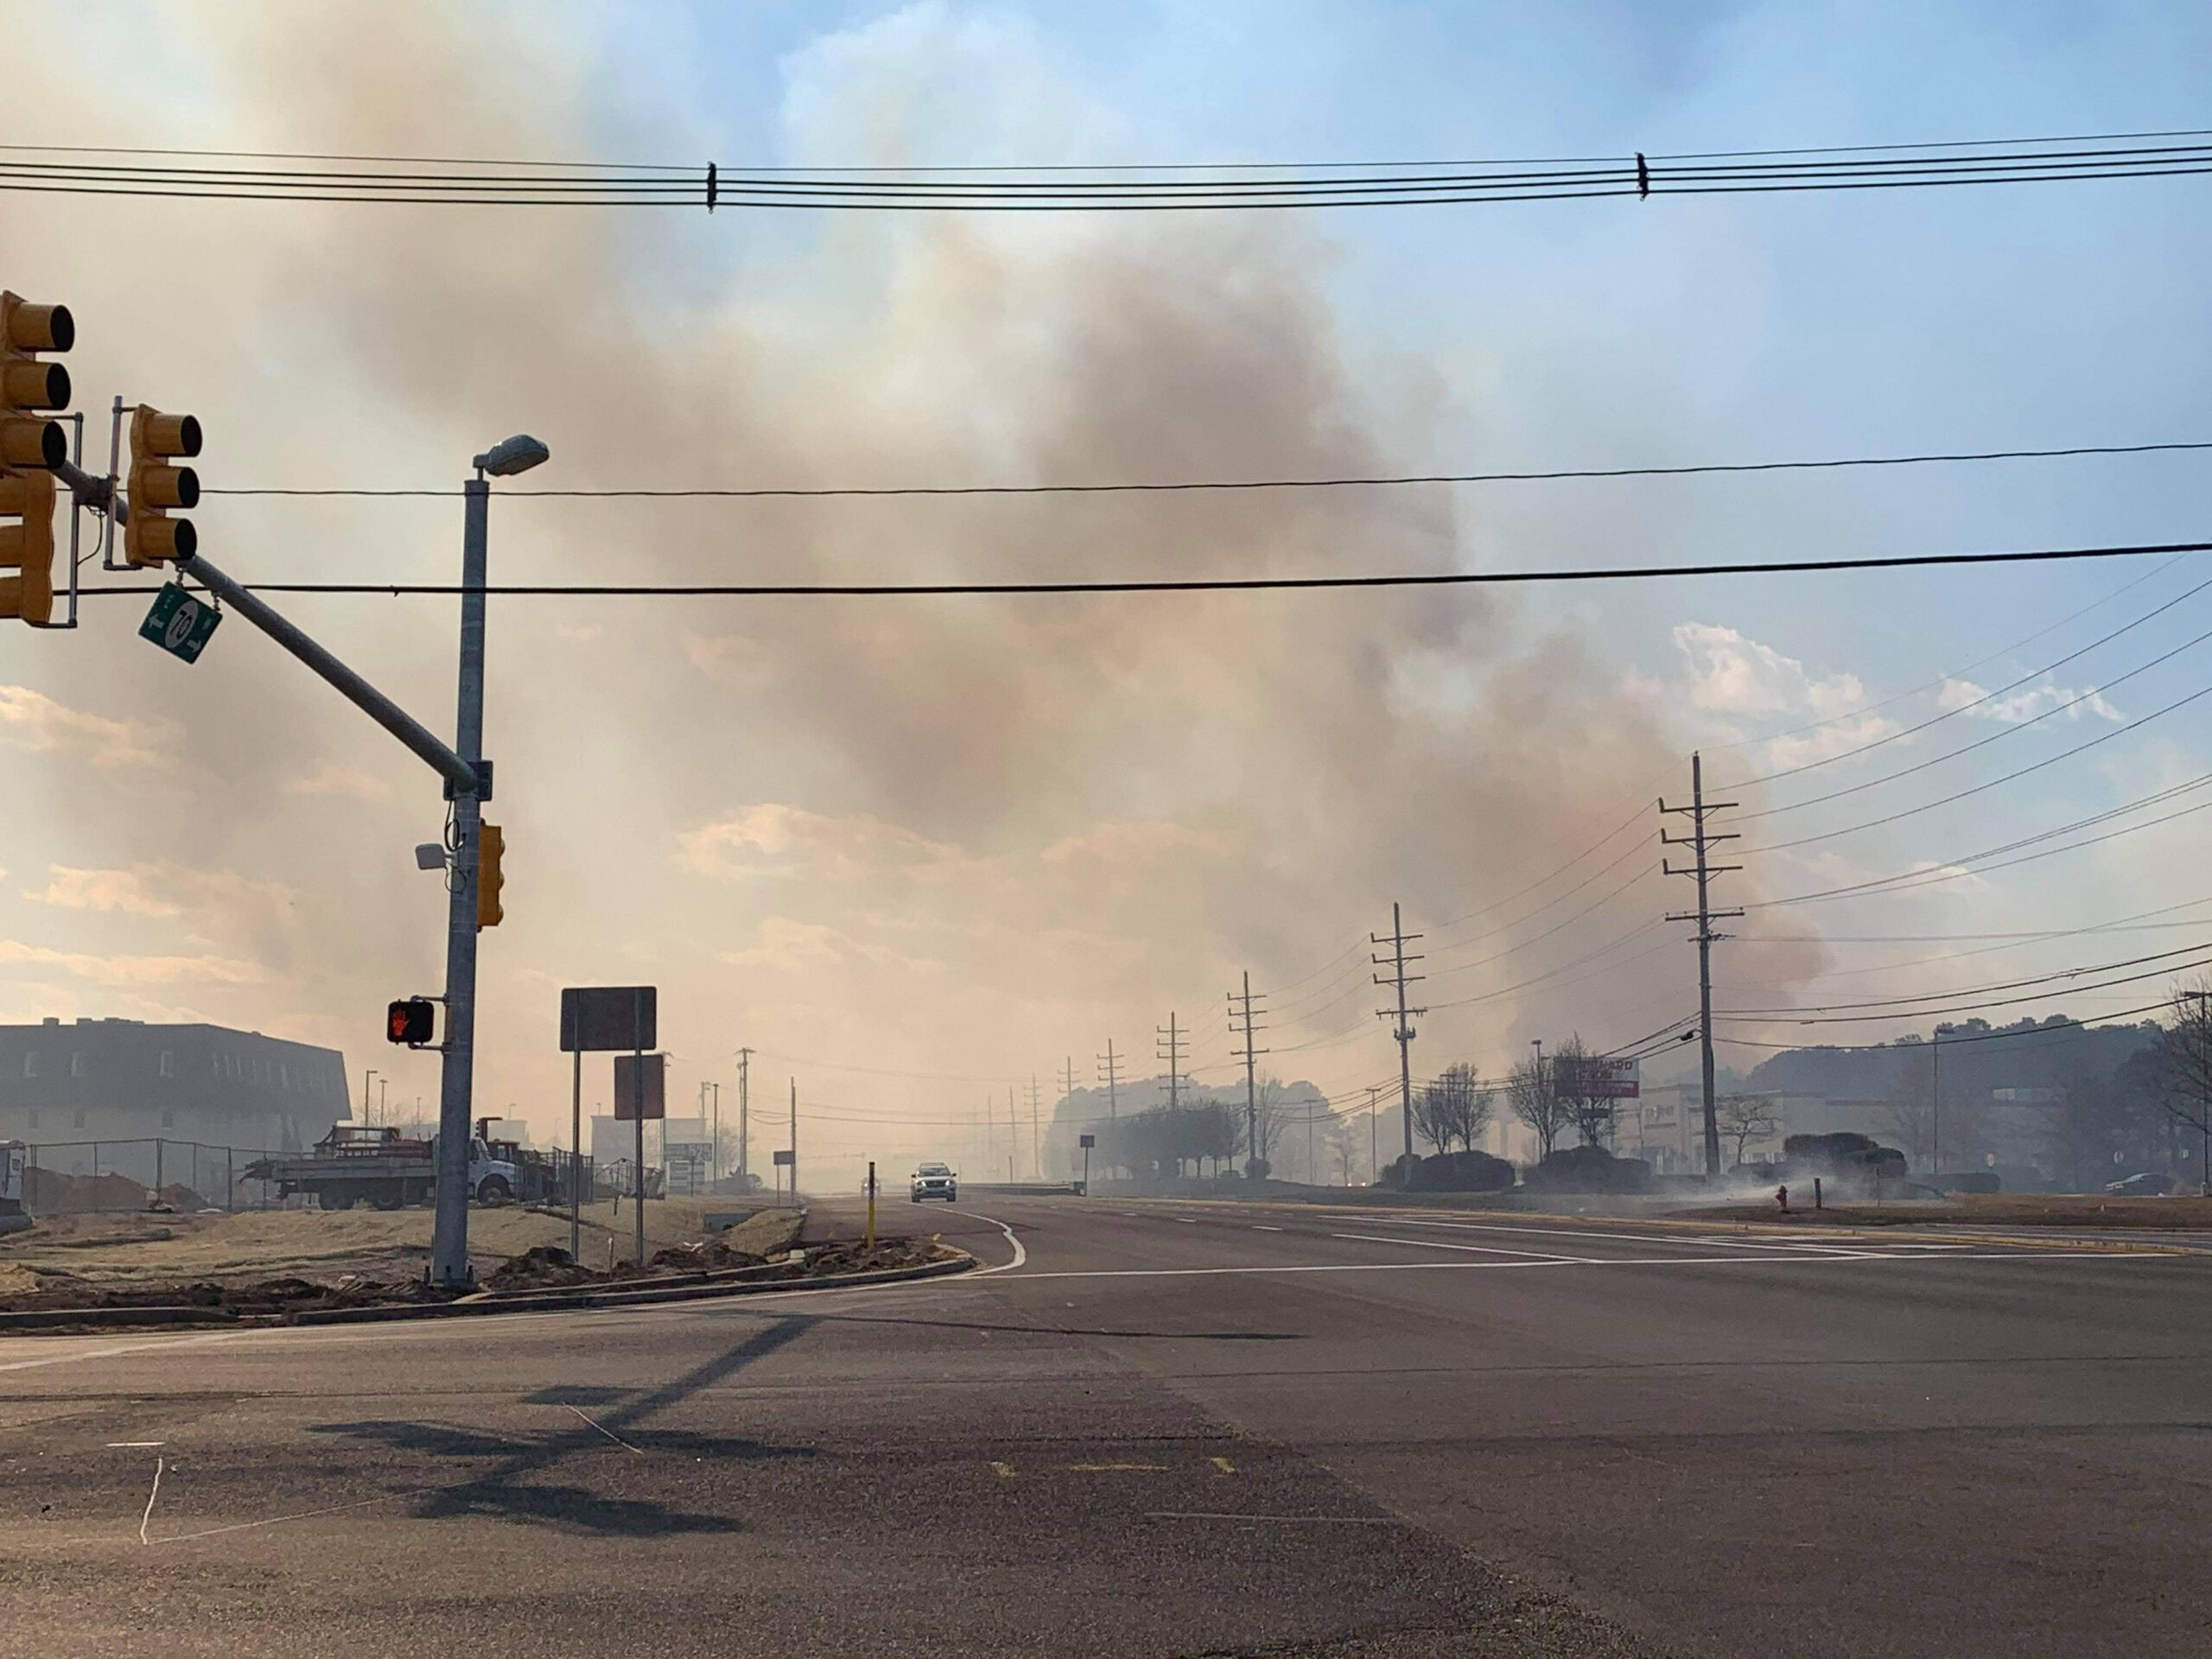 OCPO: Sunday's Massive Brush Fire was Intentionally Set- 167 Acres Burned